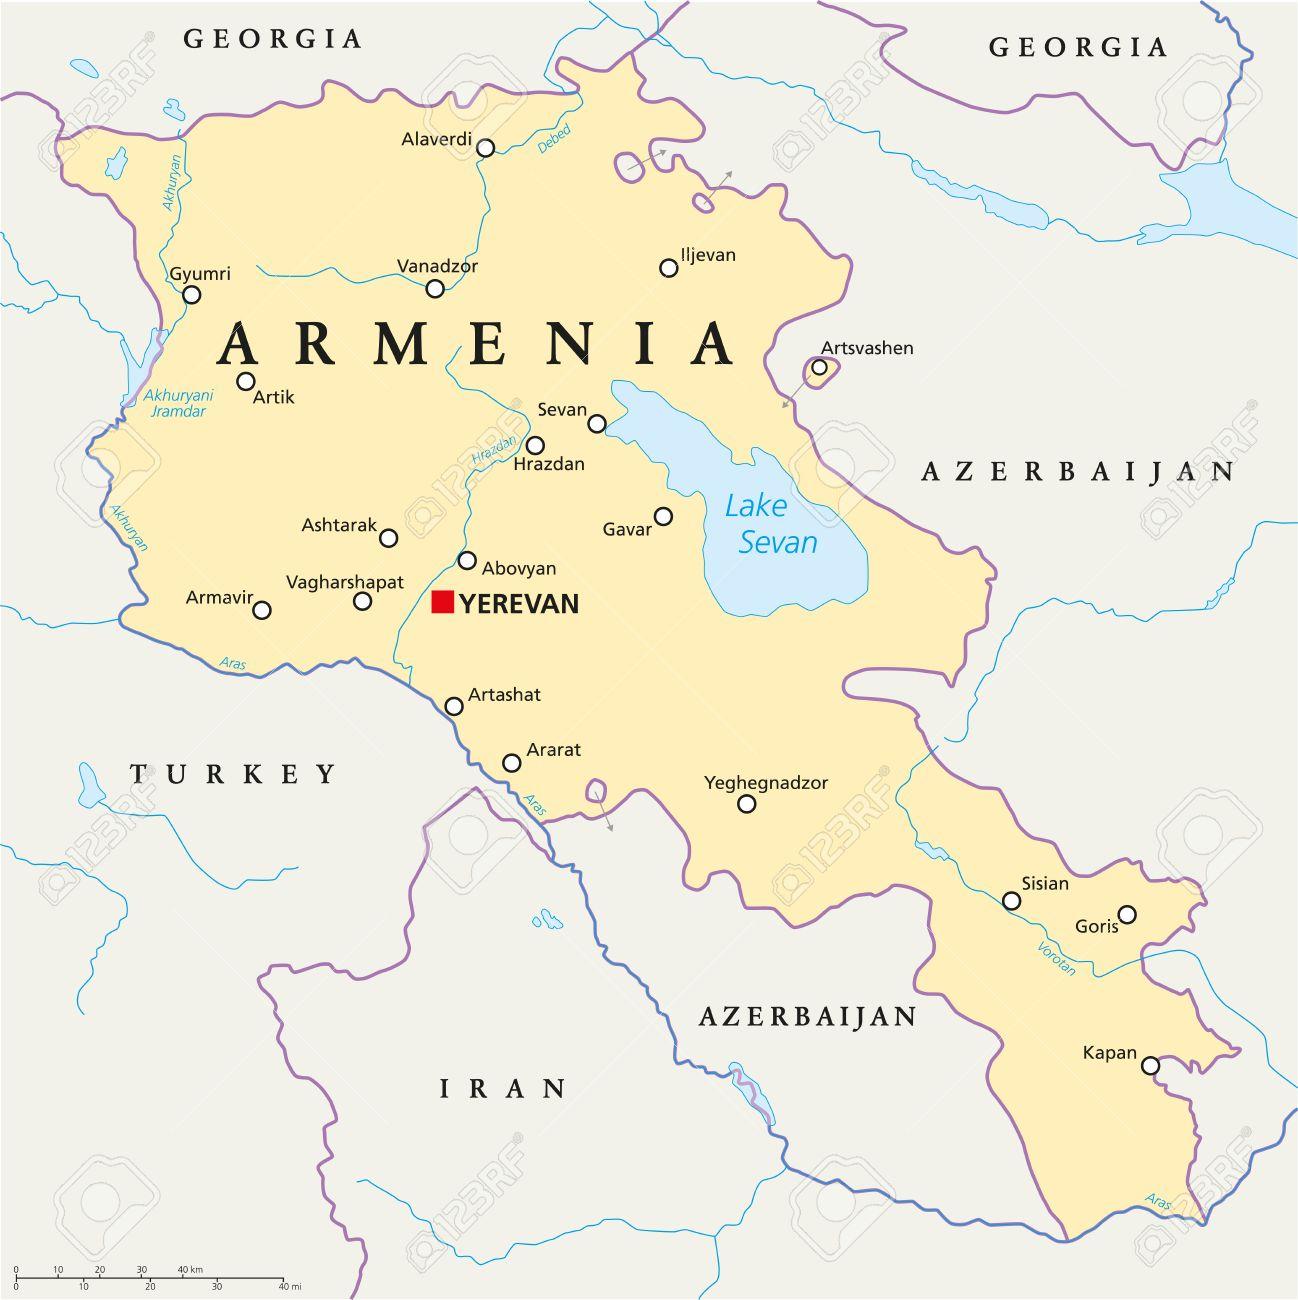 armenia mapa Armenia Mapa Político Con Los De Capital Ereván, Fronteras  armenia mapa